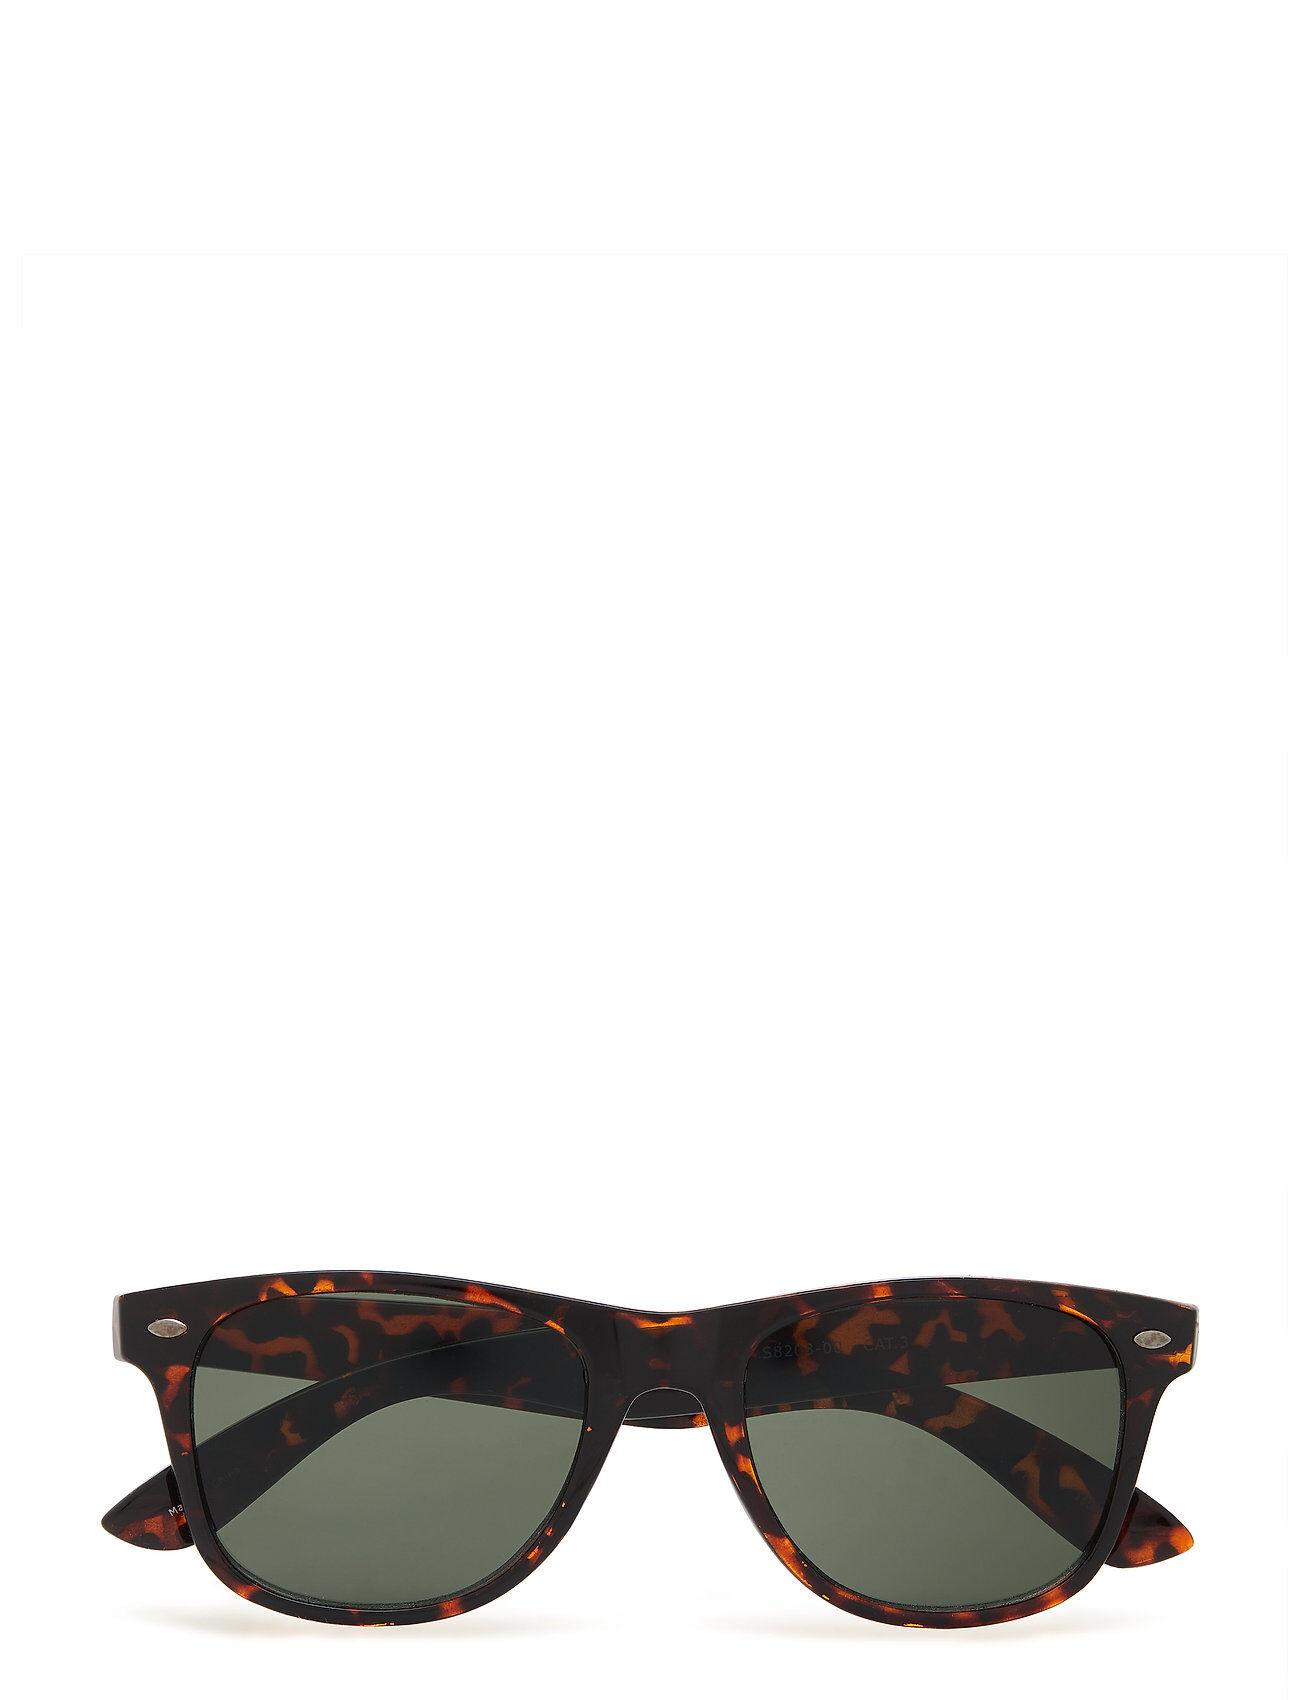 Image of SELECTED HOMME Slhthomas Sunglasses B Aurinkolasit Ruskea SELECTED HOMME